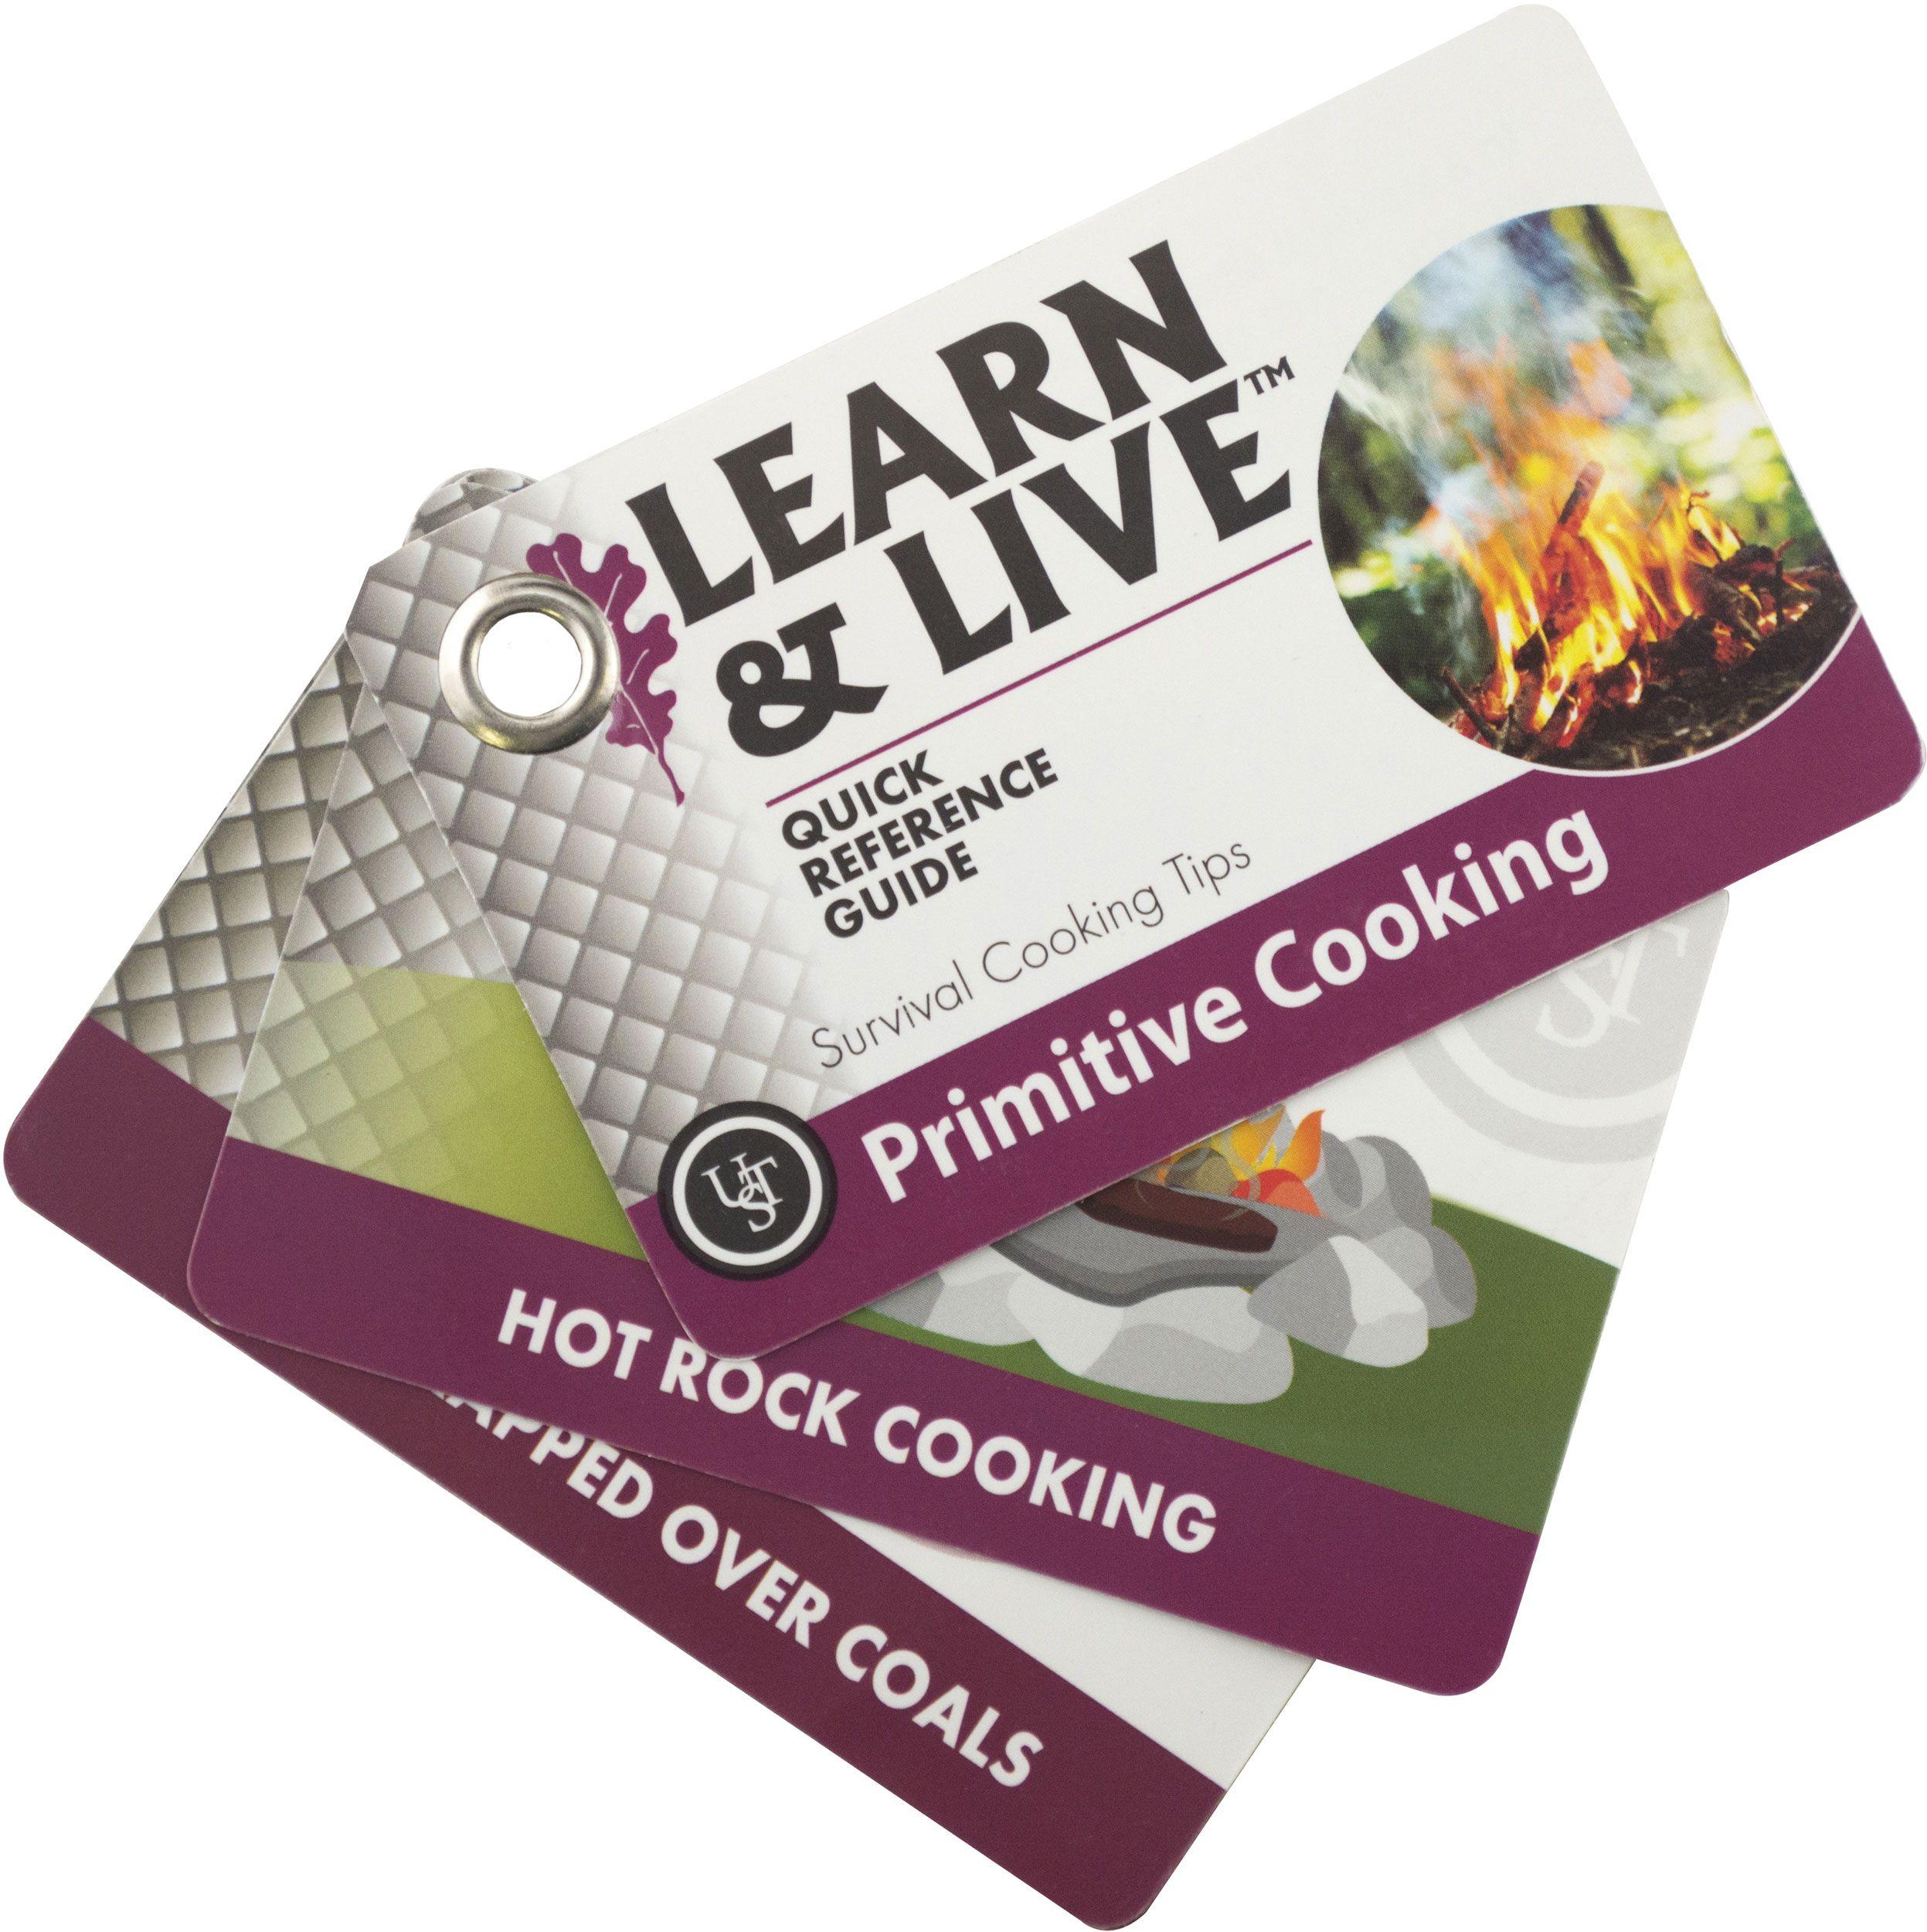 UST Ultimate Survival Learn & Live Primitive Cooking Cards